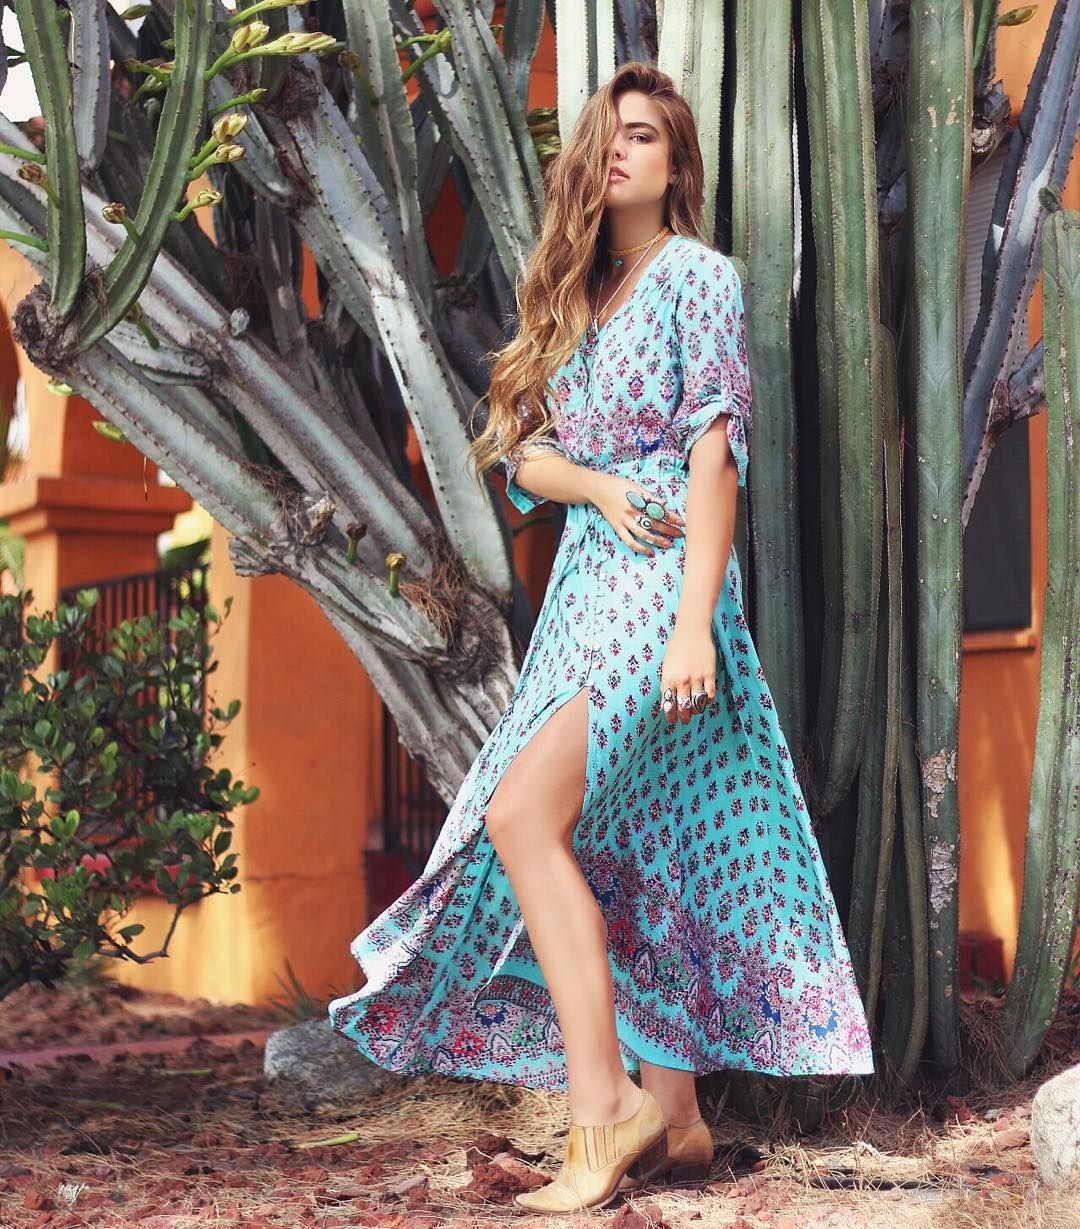 """Cactus livin' ⚡️ wearing @lesalty_label // :@dancingwithflyingcolors"""